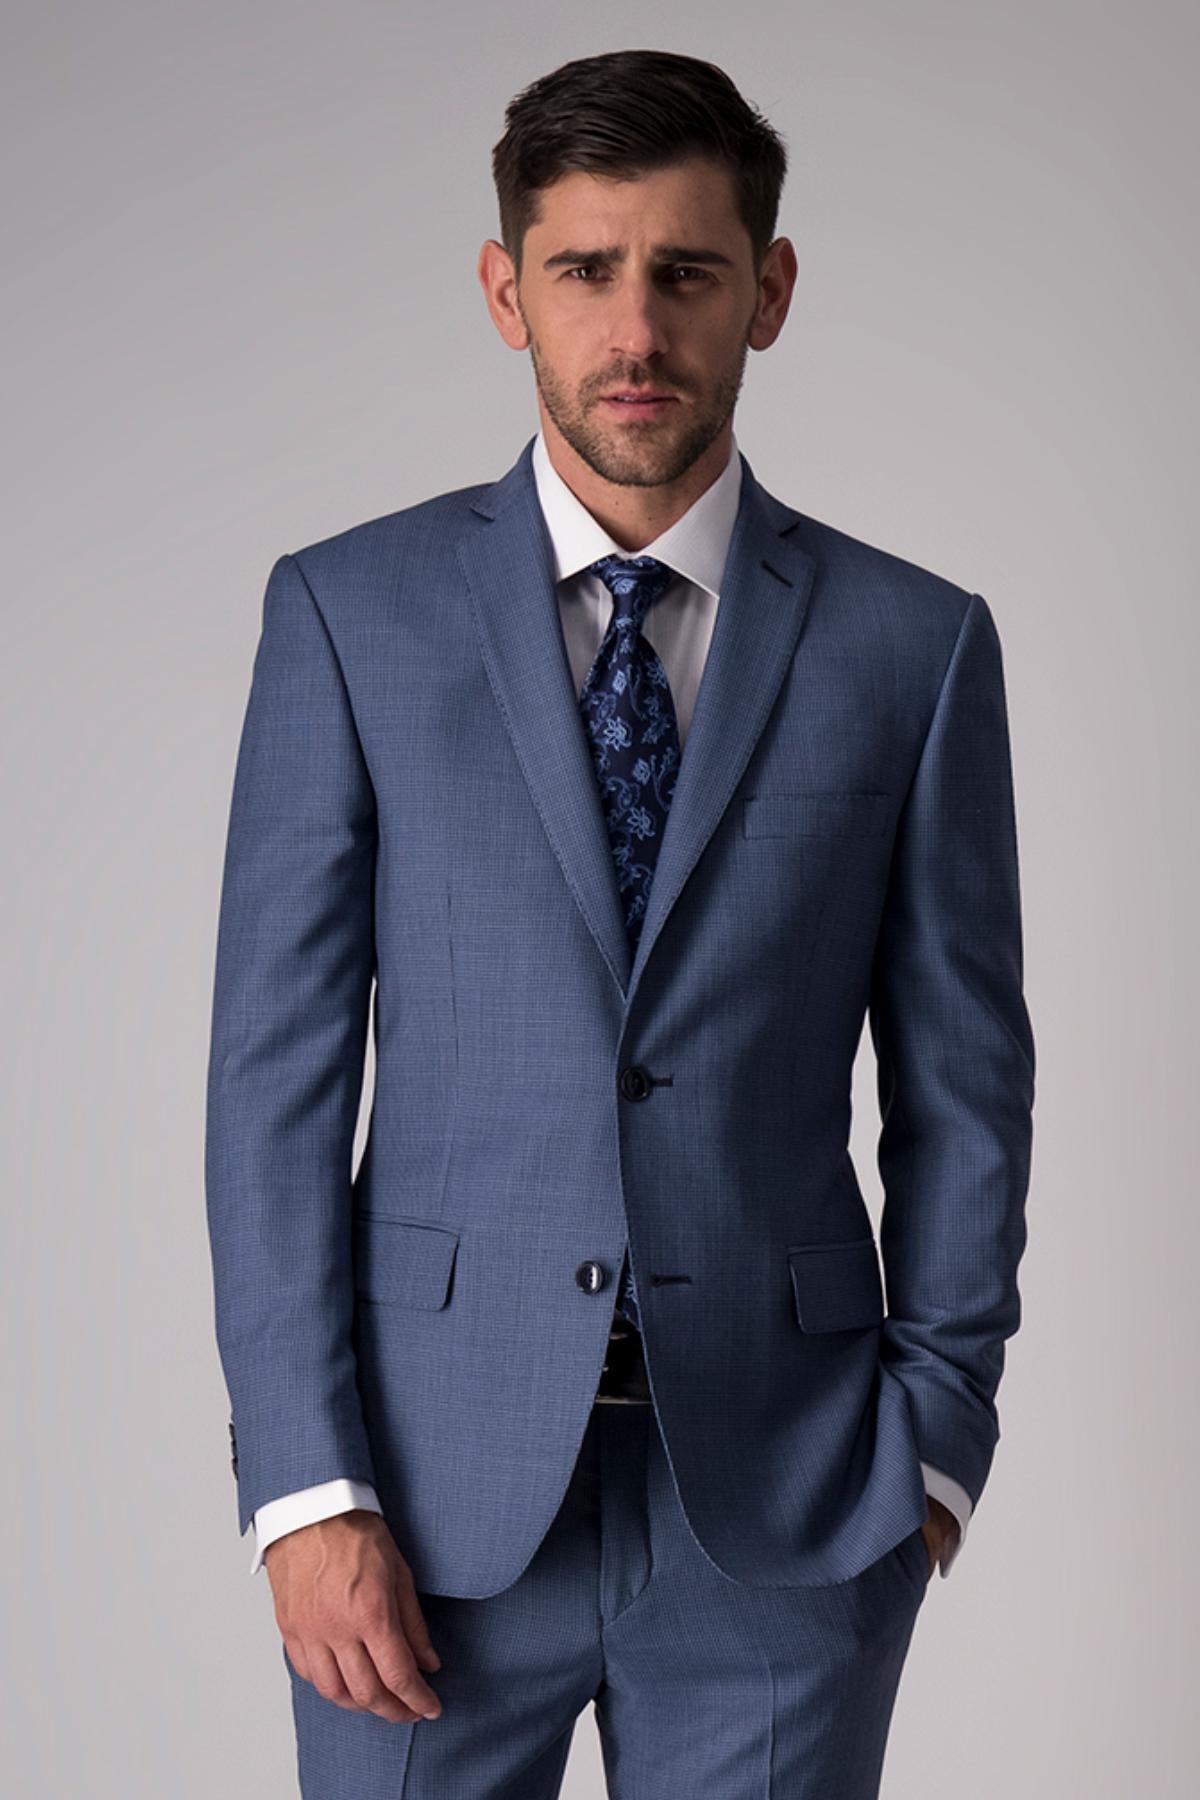 Traje Robert´s, 100% lana, slim fit, liso azul claro.